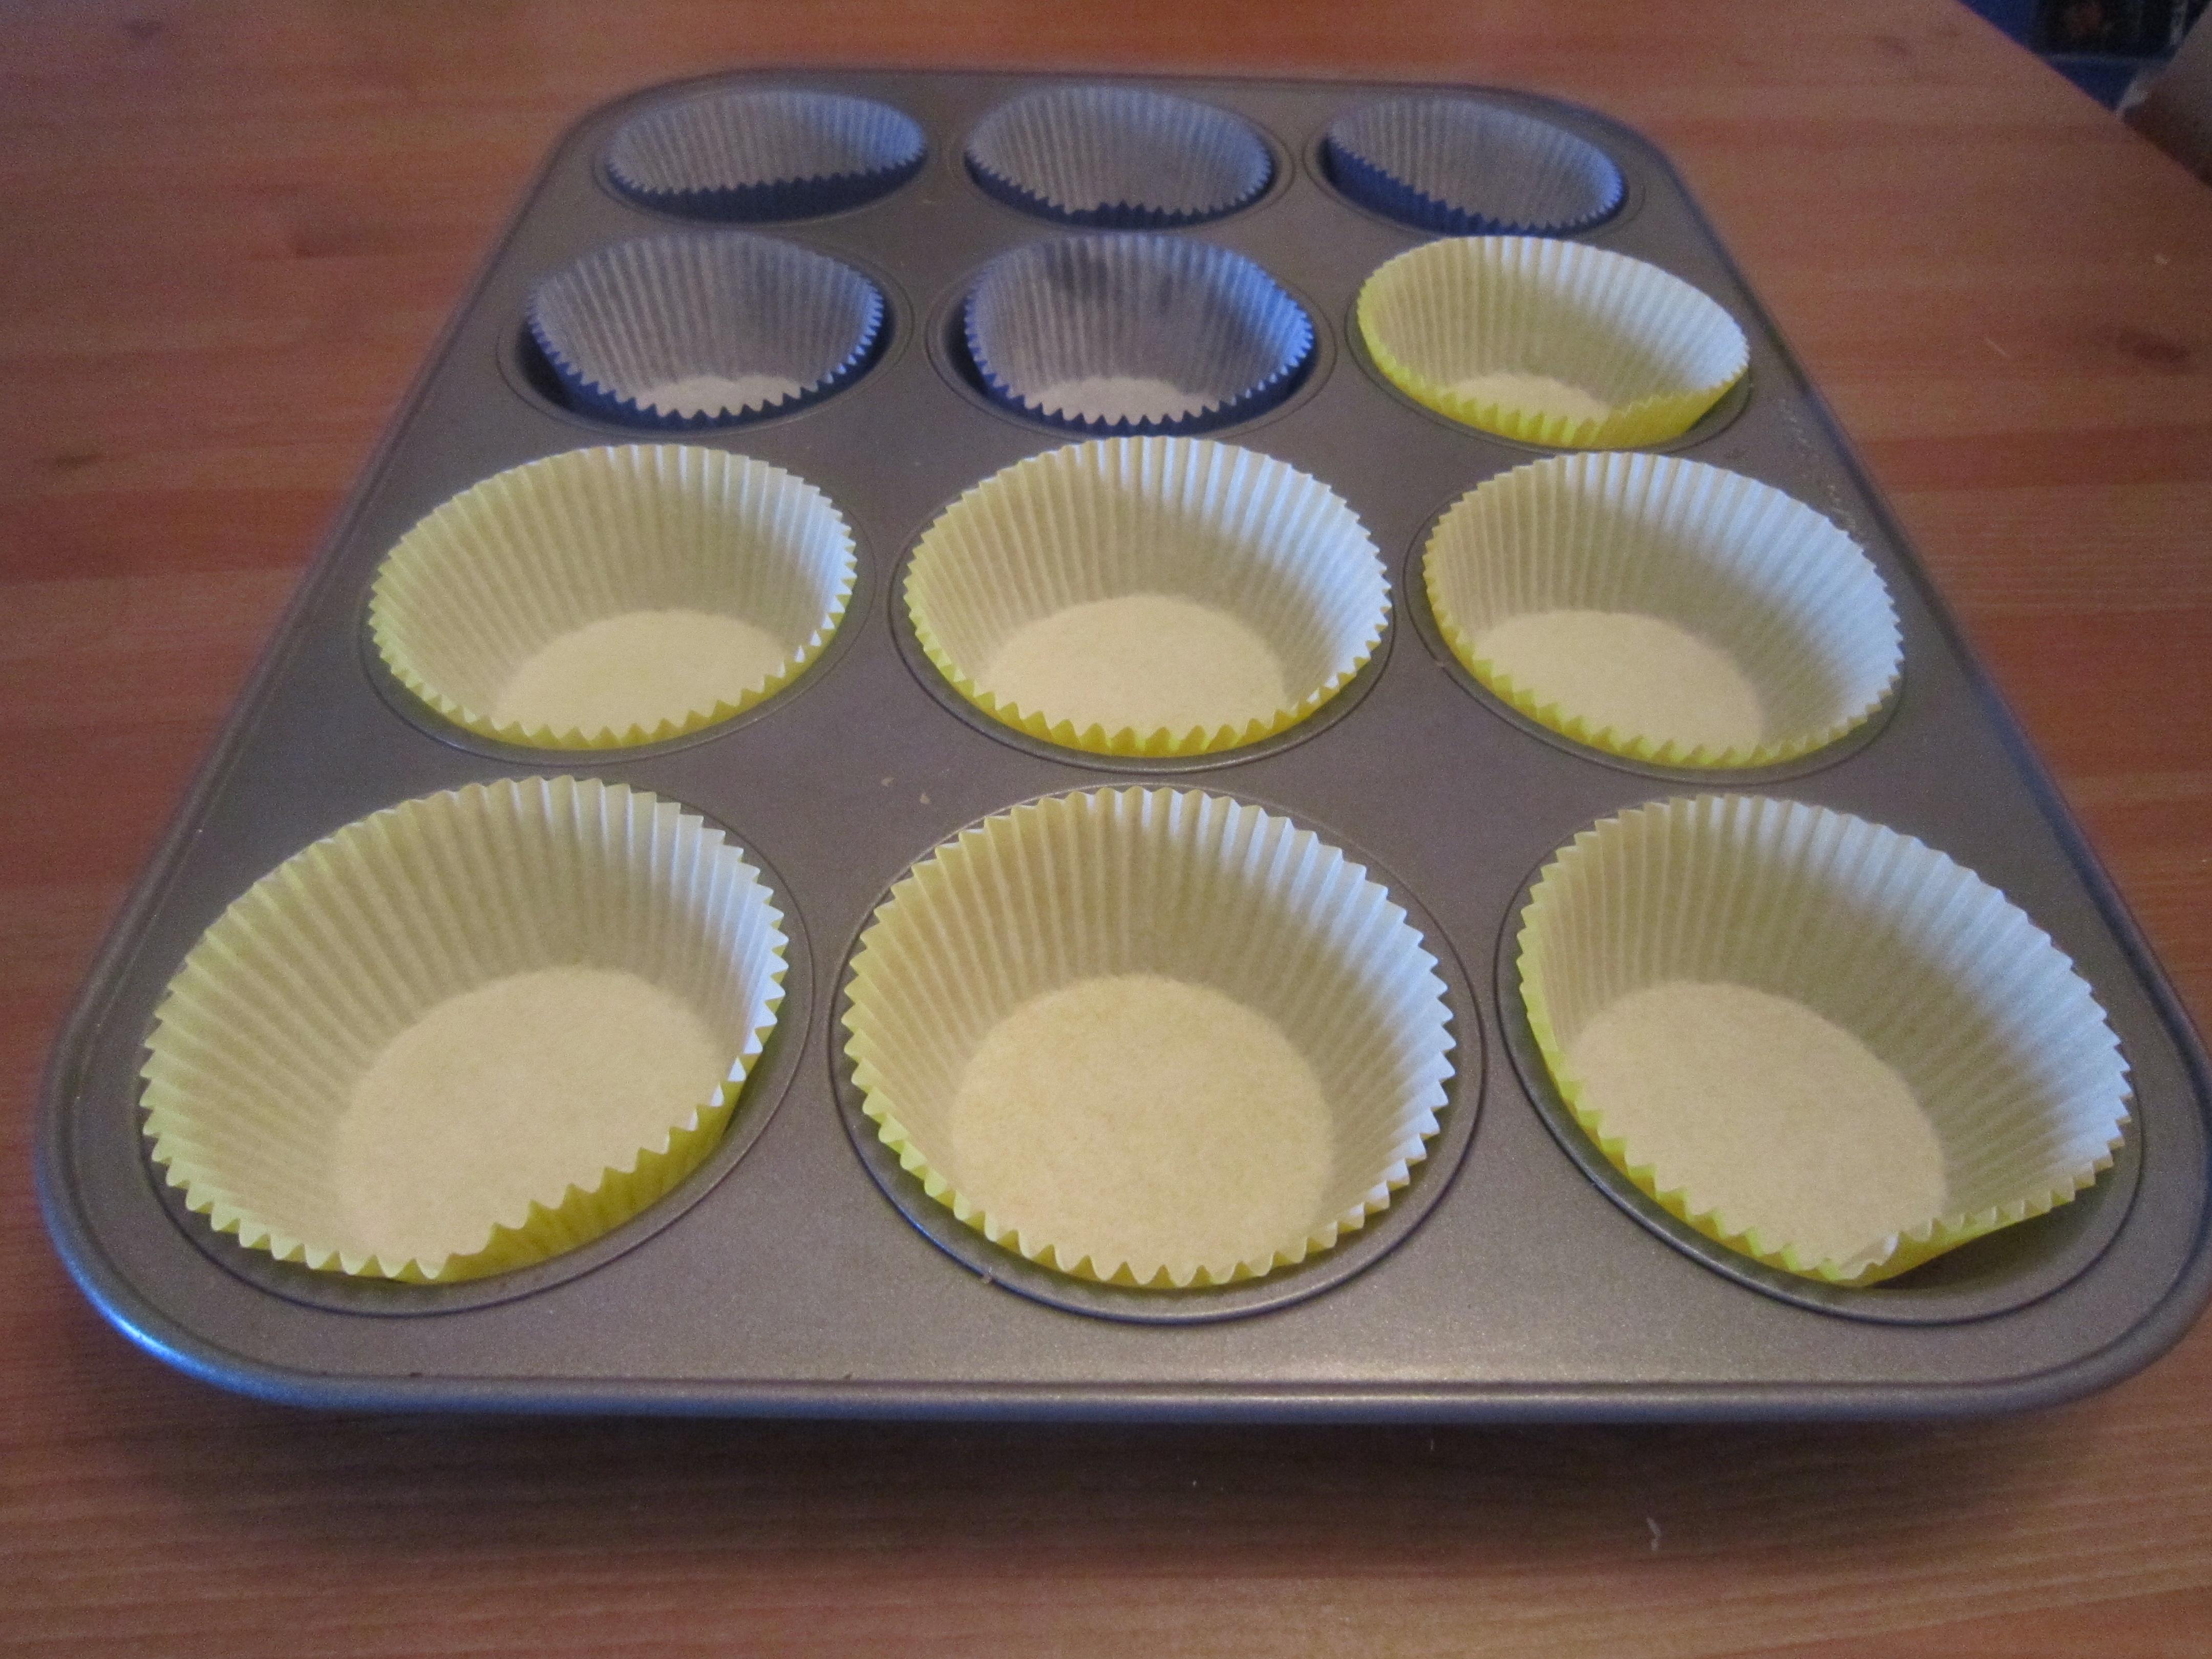 Muffin Top Muffin Cups : Blue blueberry and banana muffins warm vanilla sugar